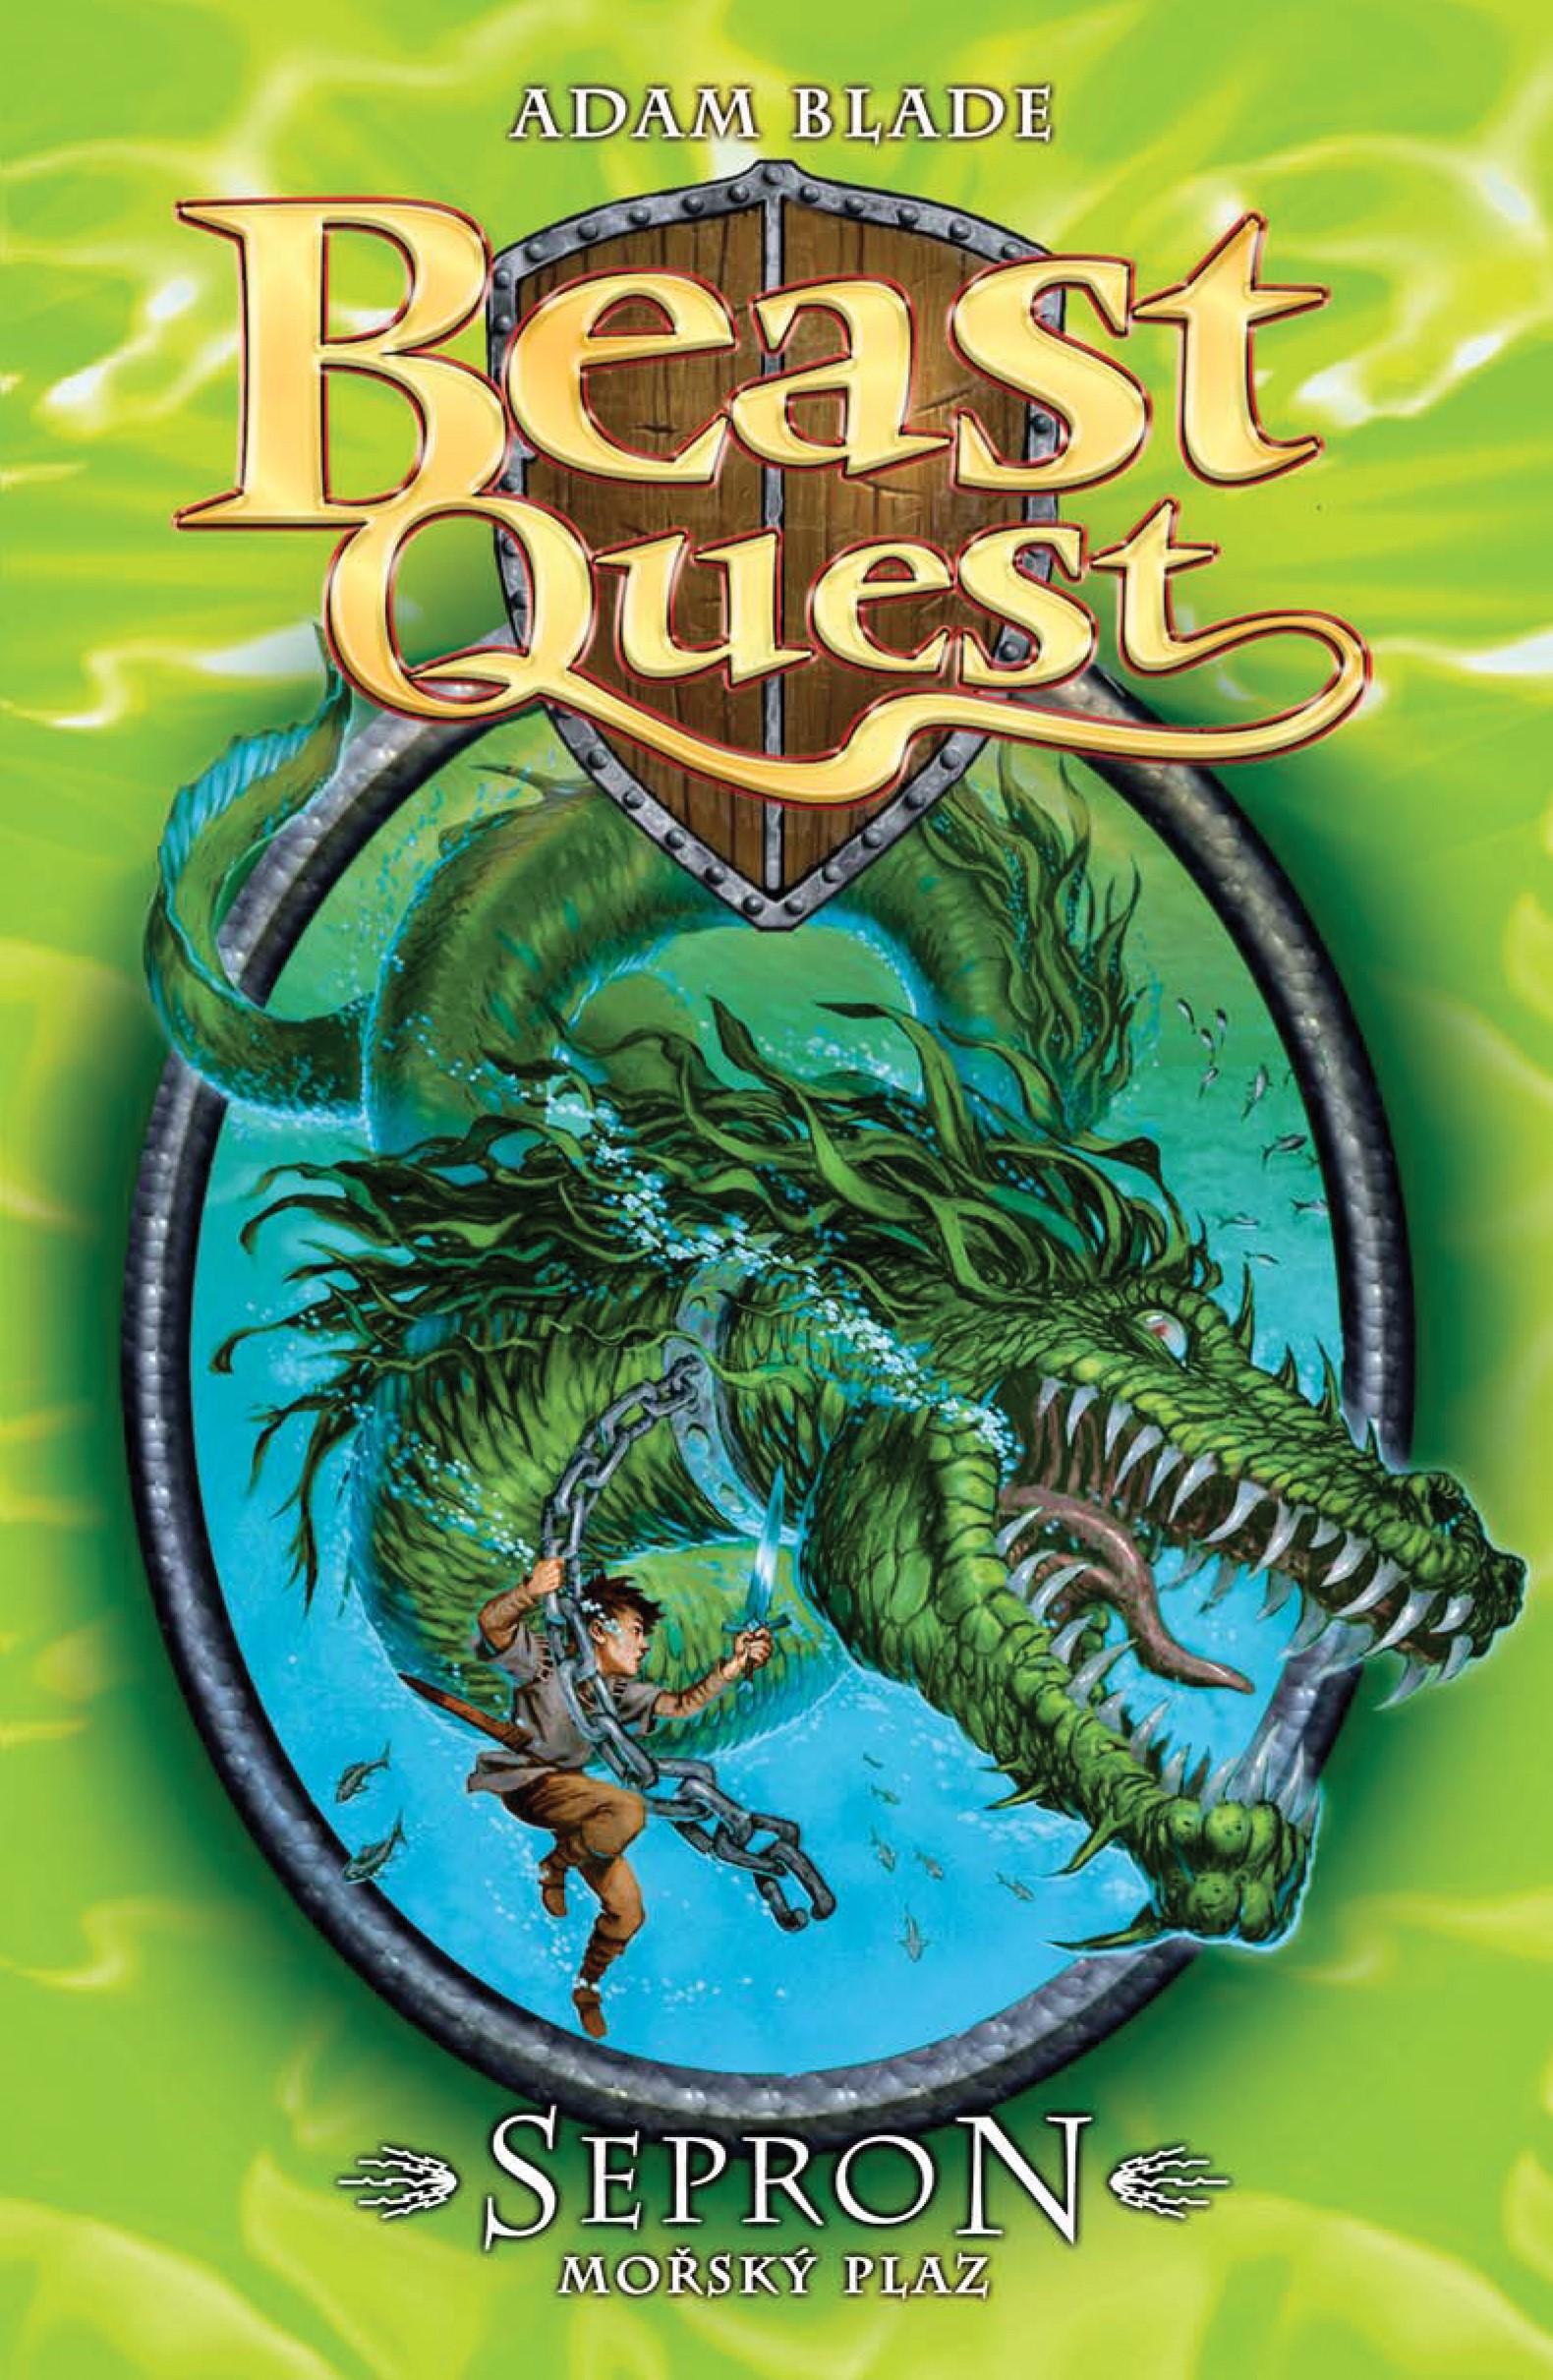 Sepron, mořský plaz - Beast Quest (2)